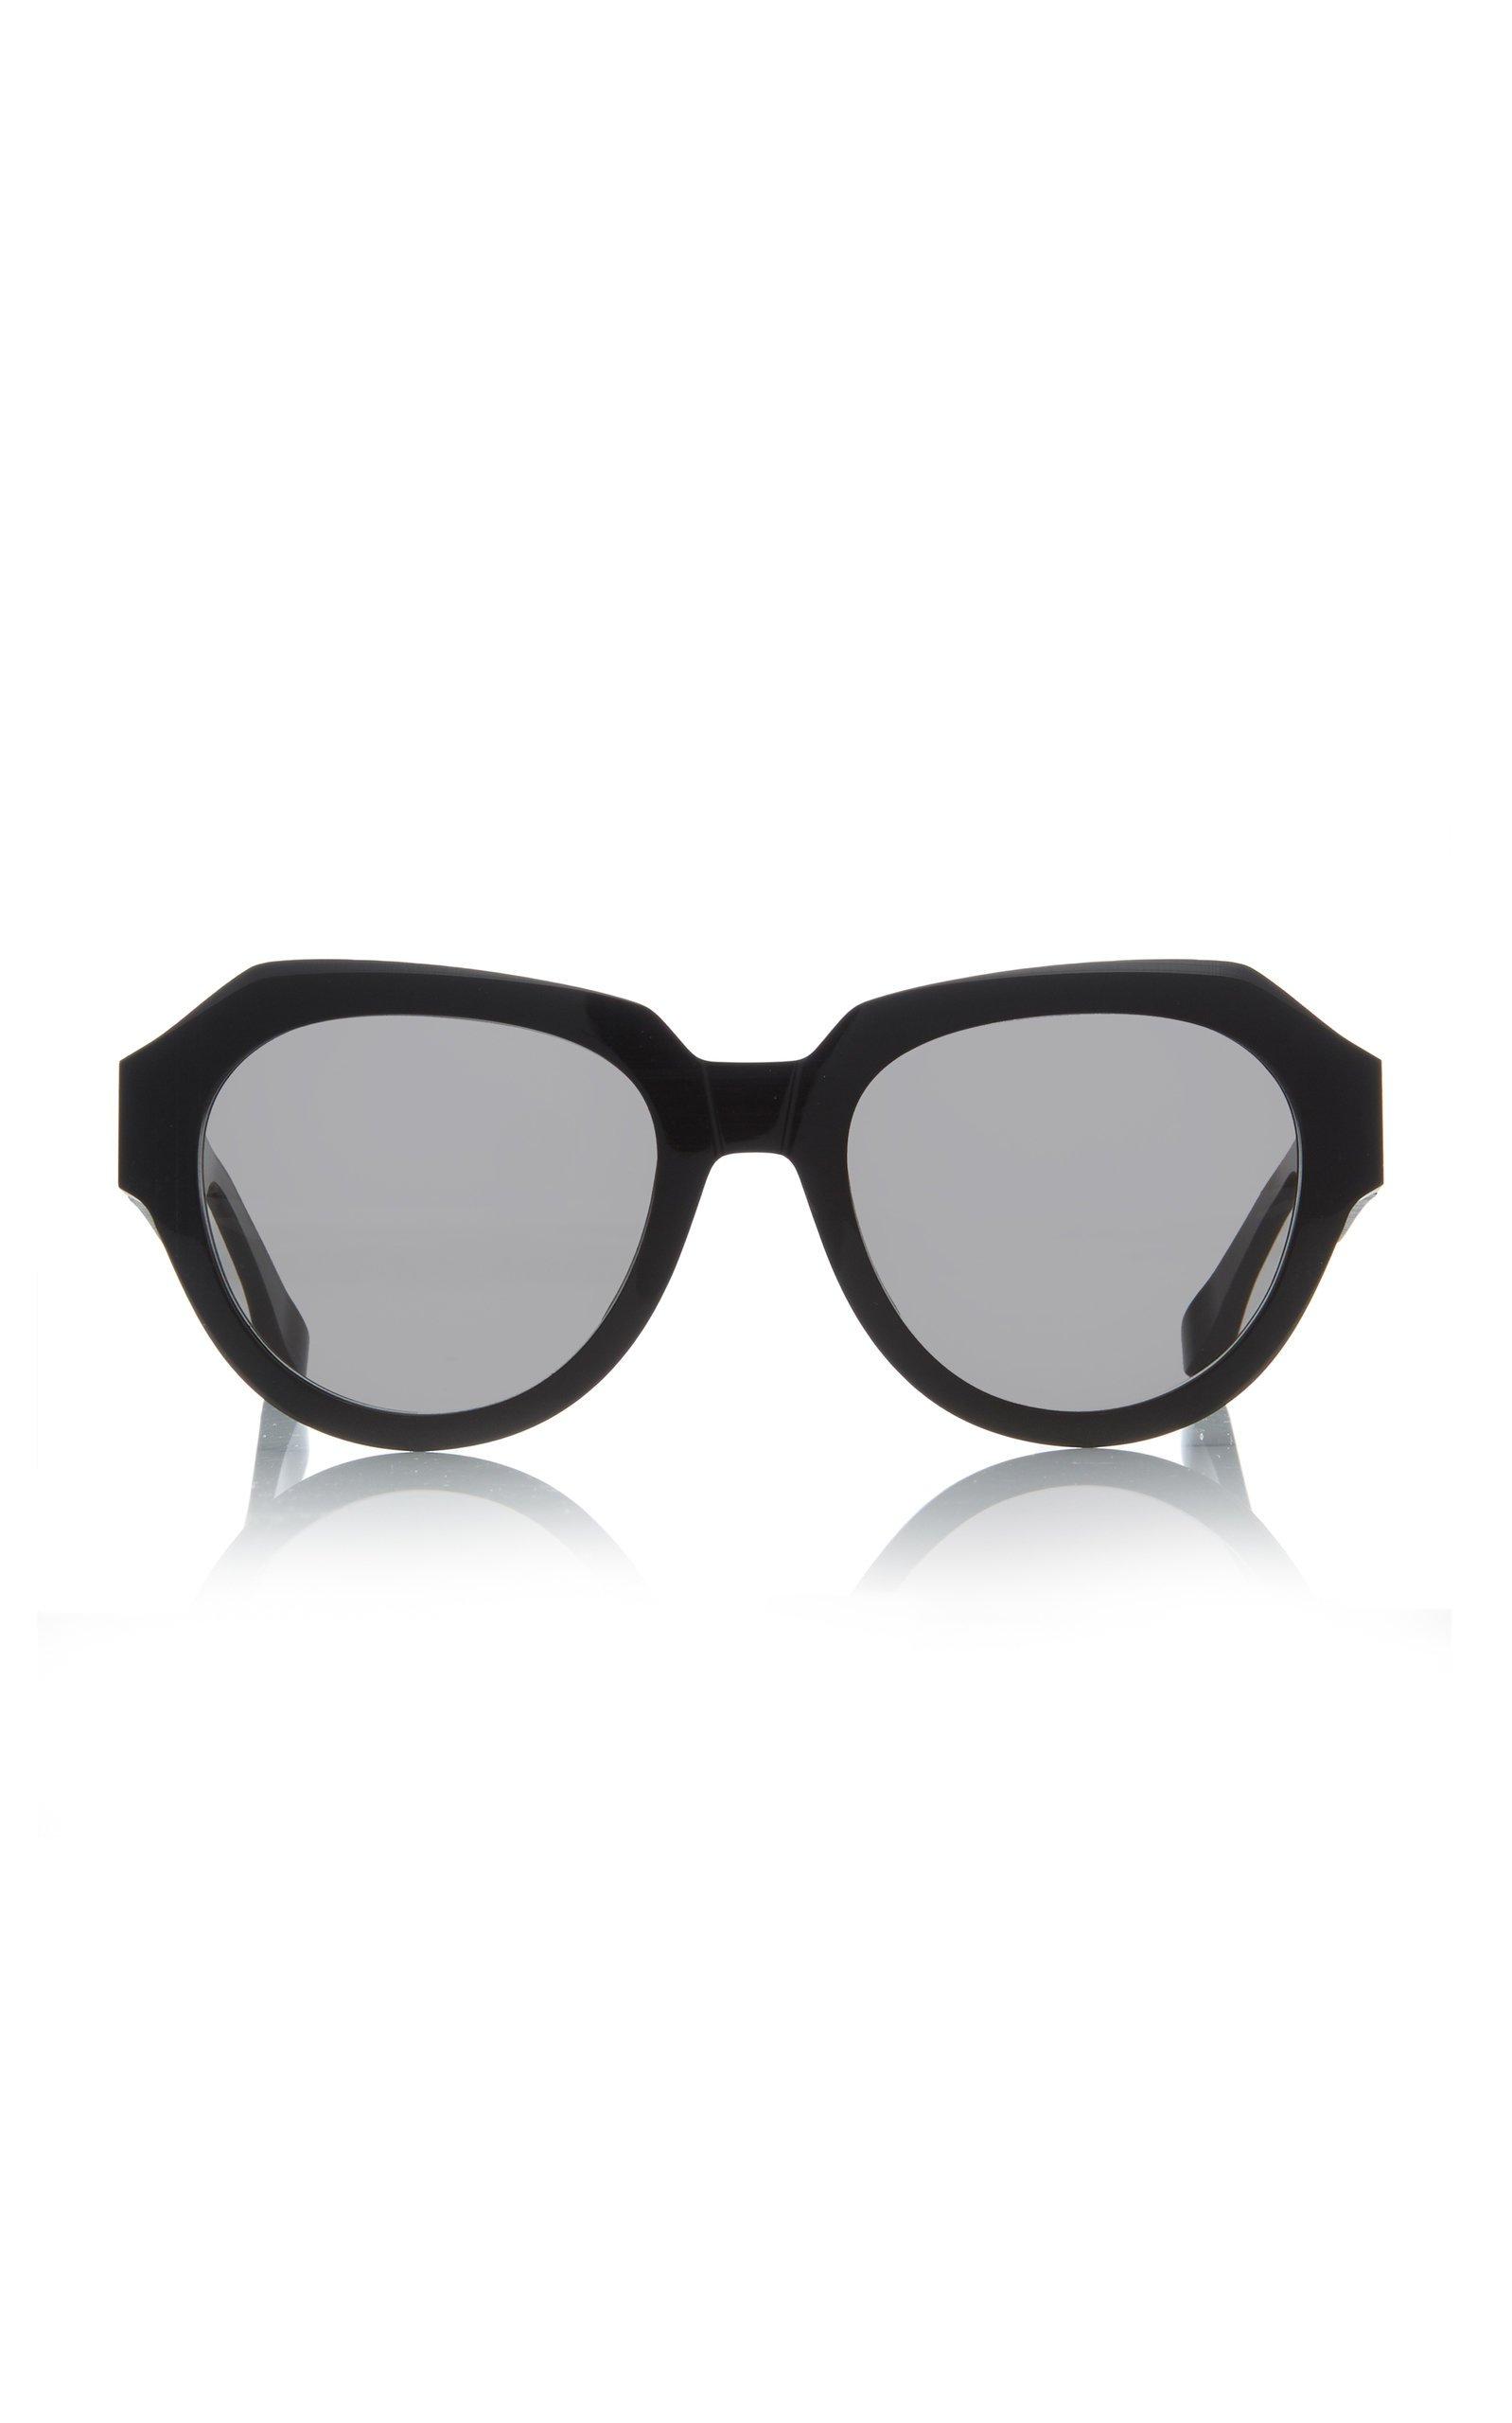 MYKITA Round-Frame Acetate Sunglasses